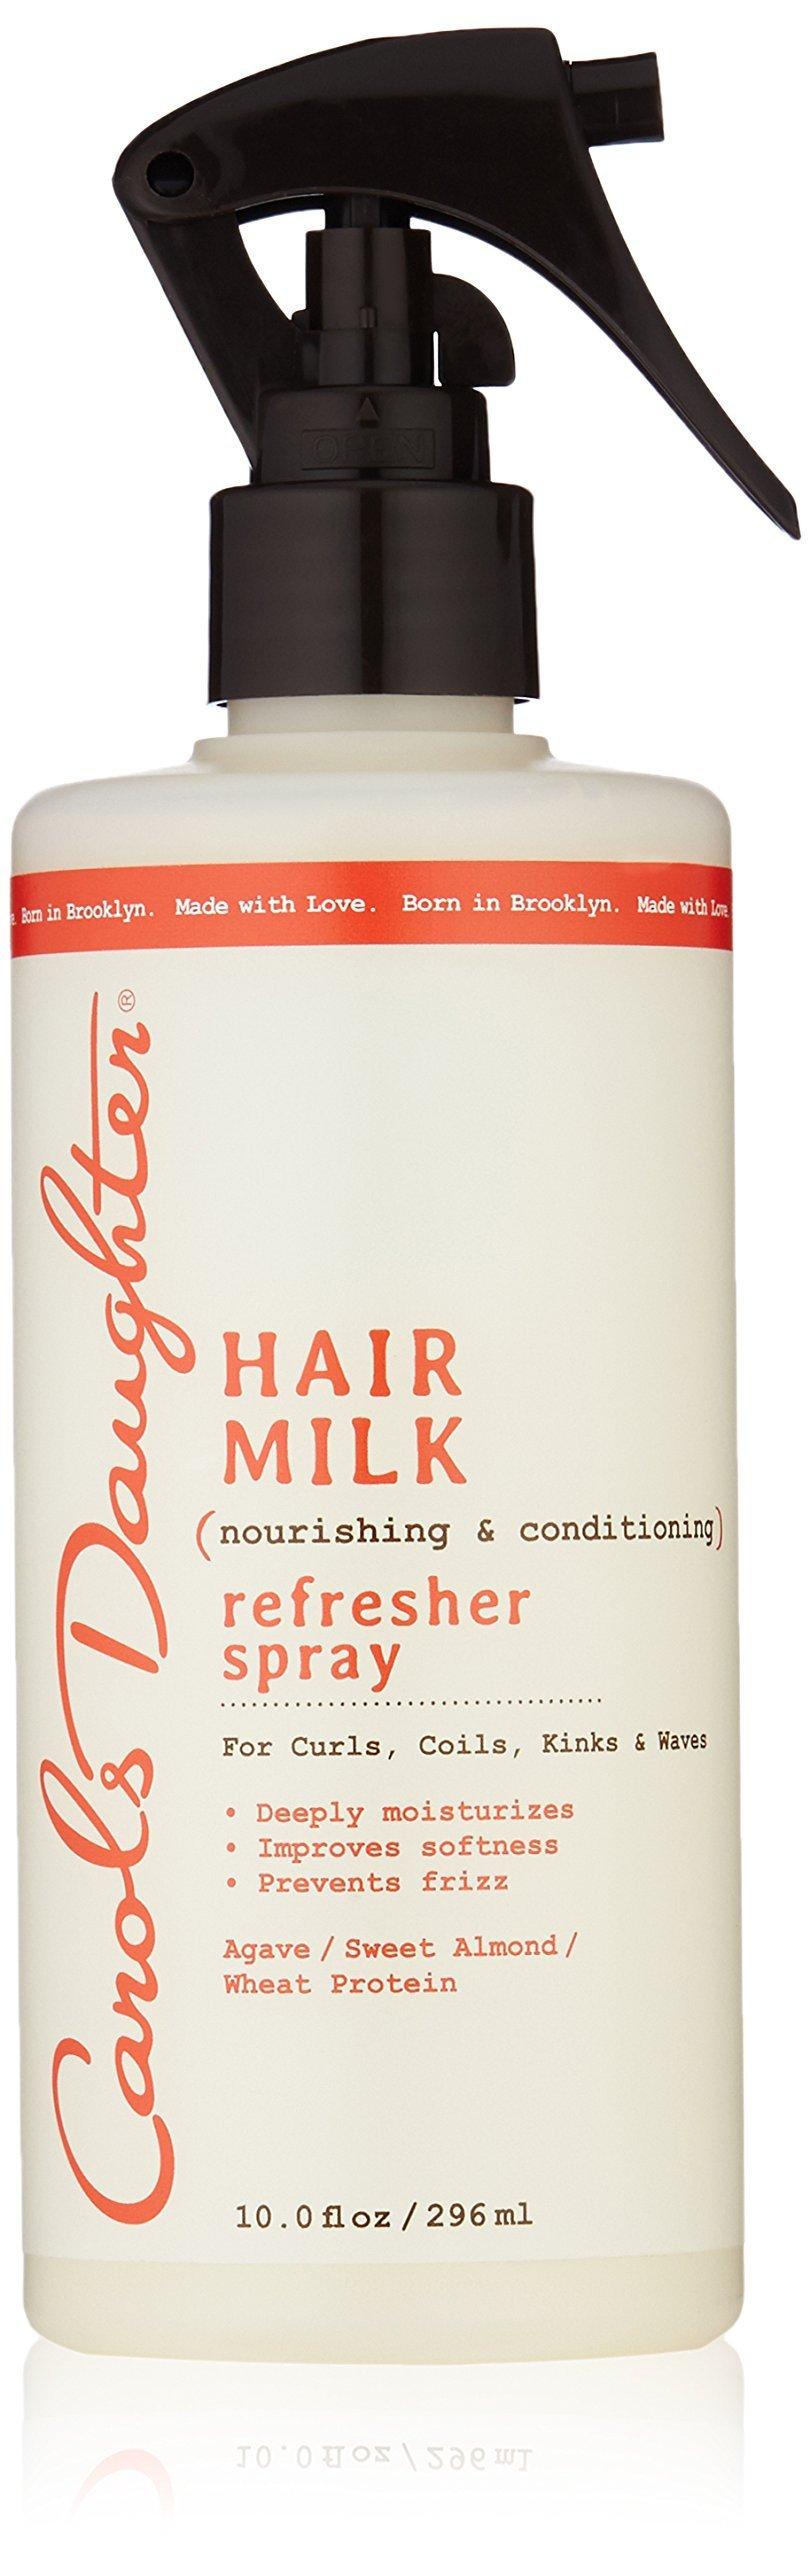 Carol's Daughter Hair Milk Refresher Spray, 10 fl oz (Packaging May Vary)